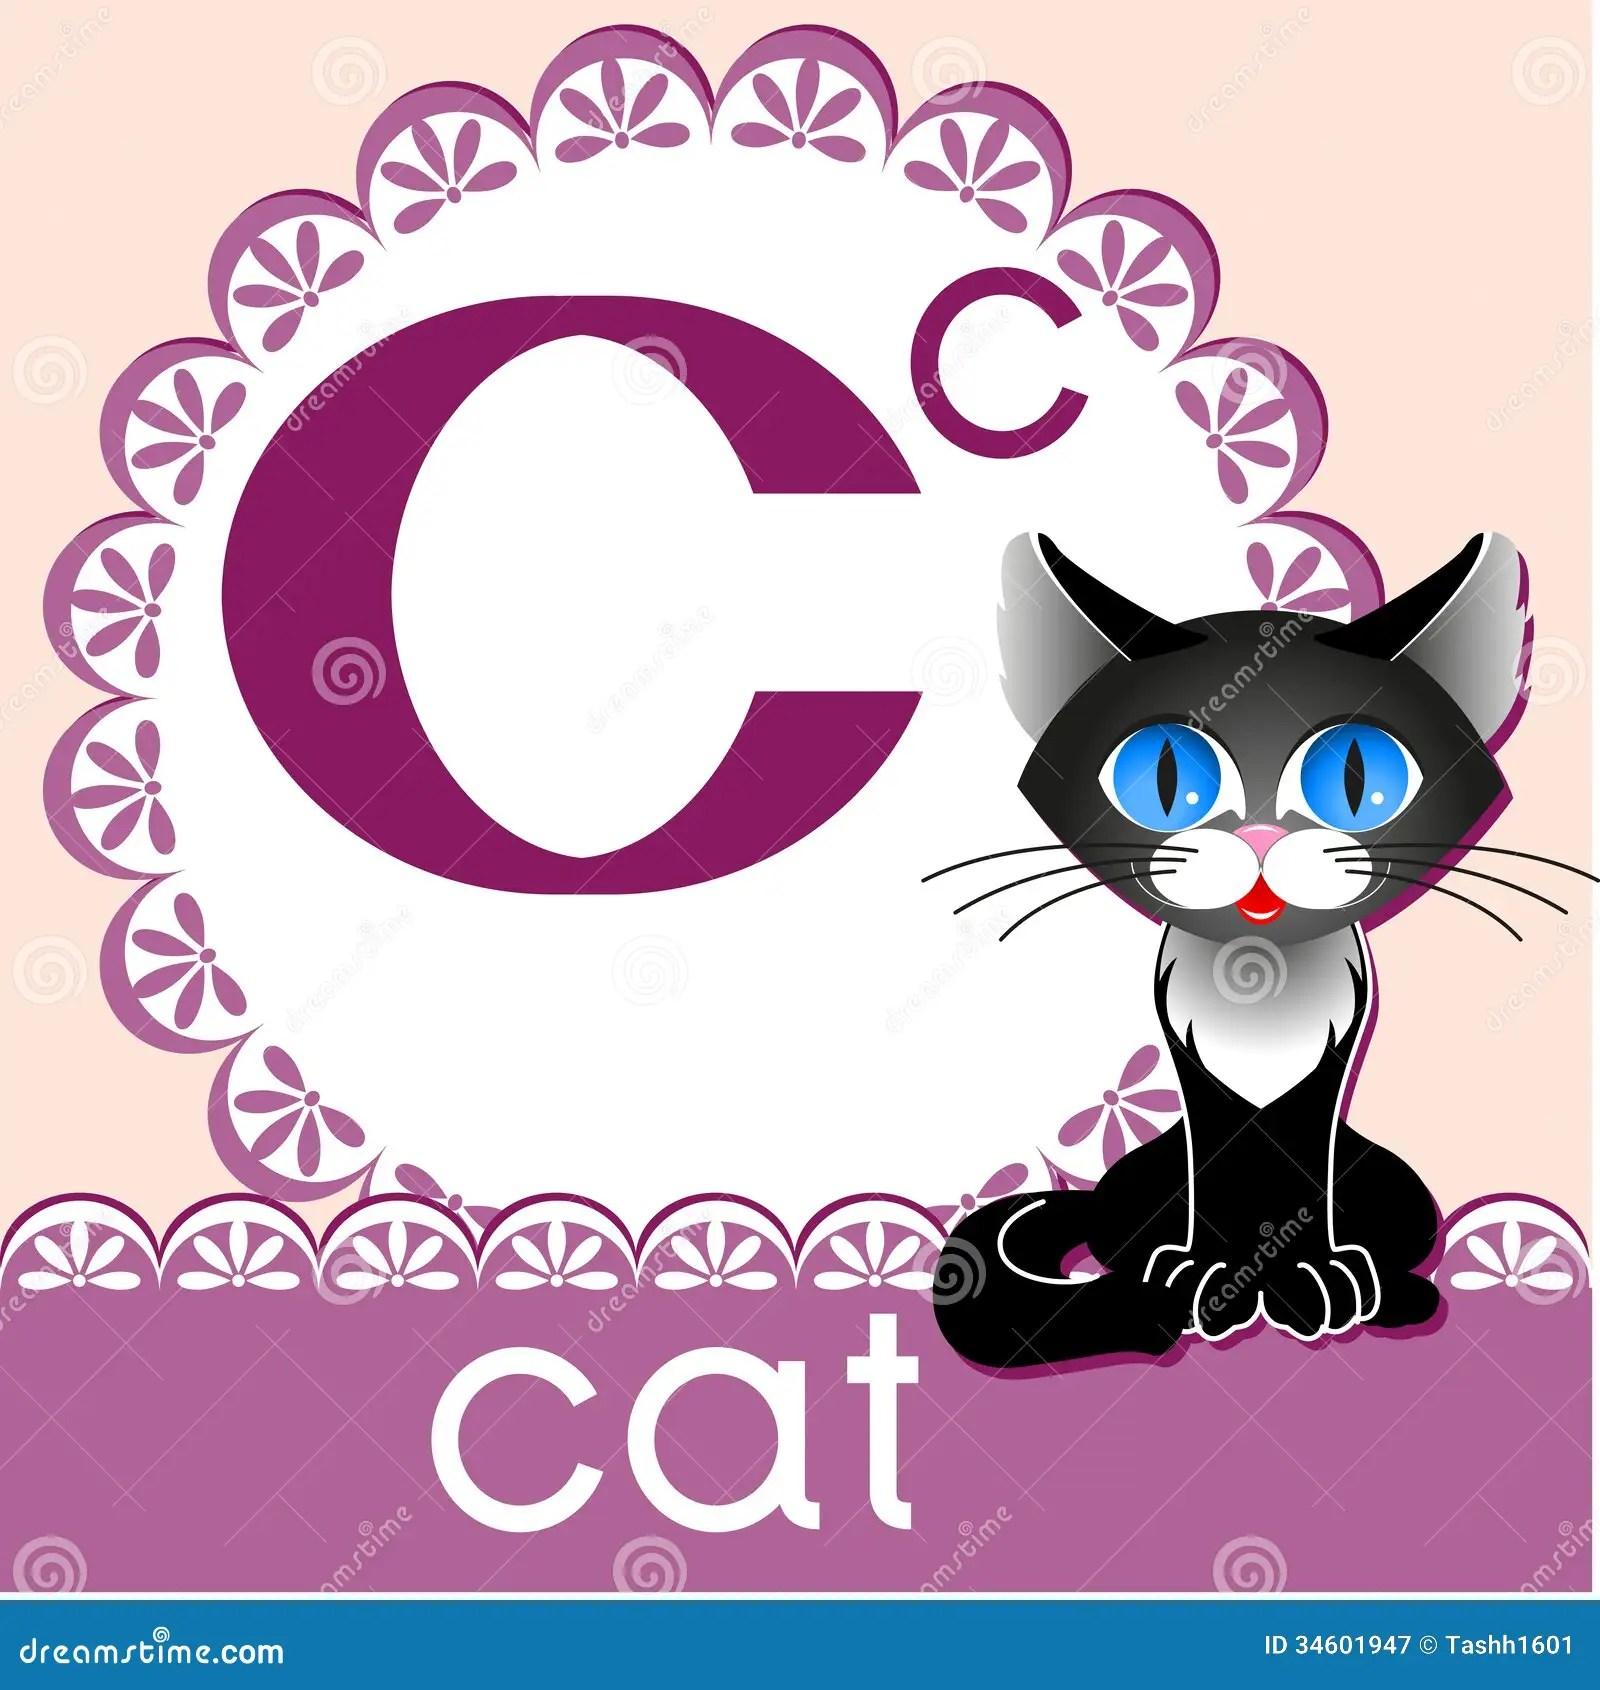 Resume Format Letter C Cat